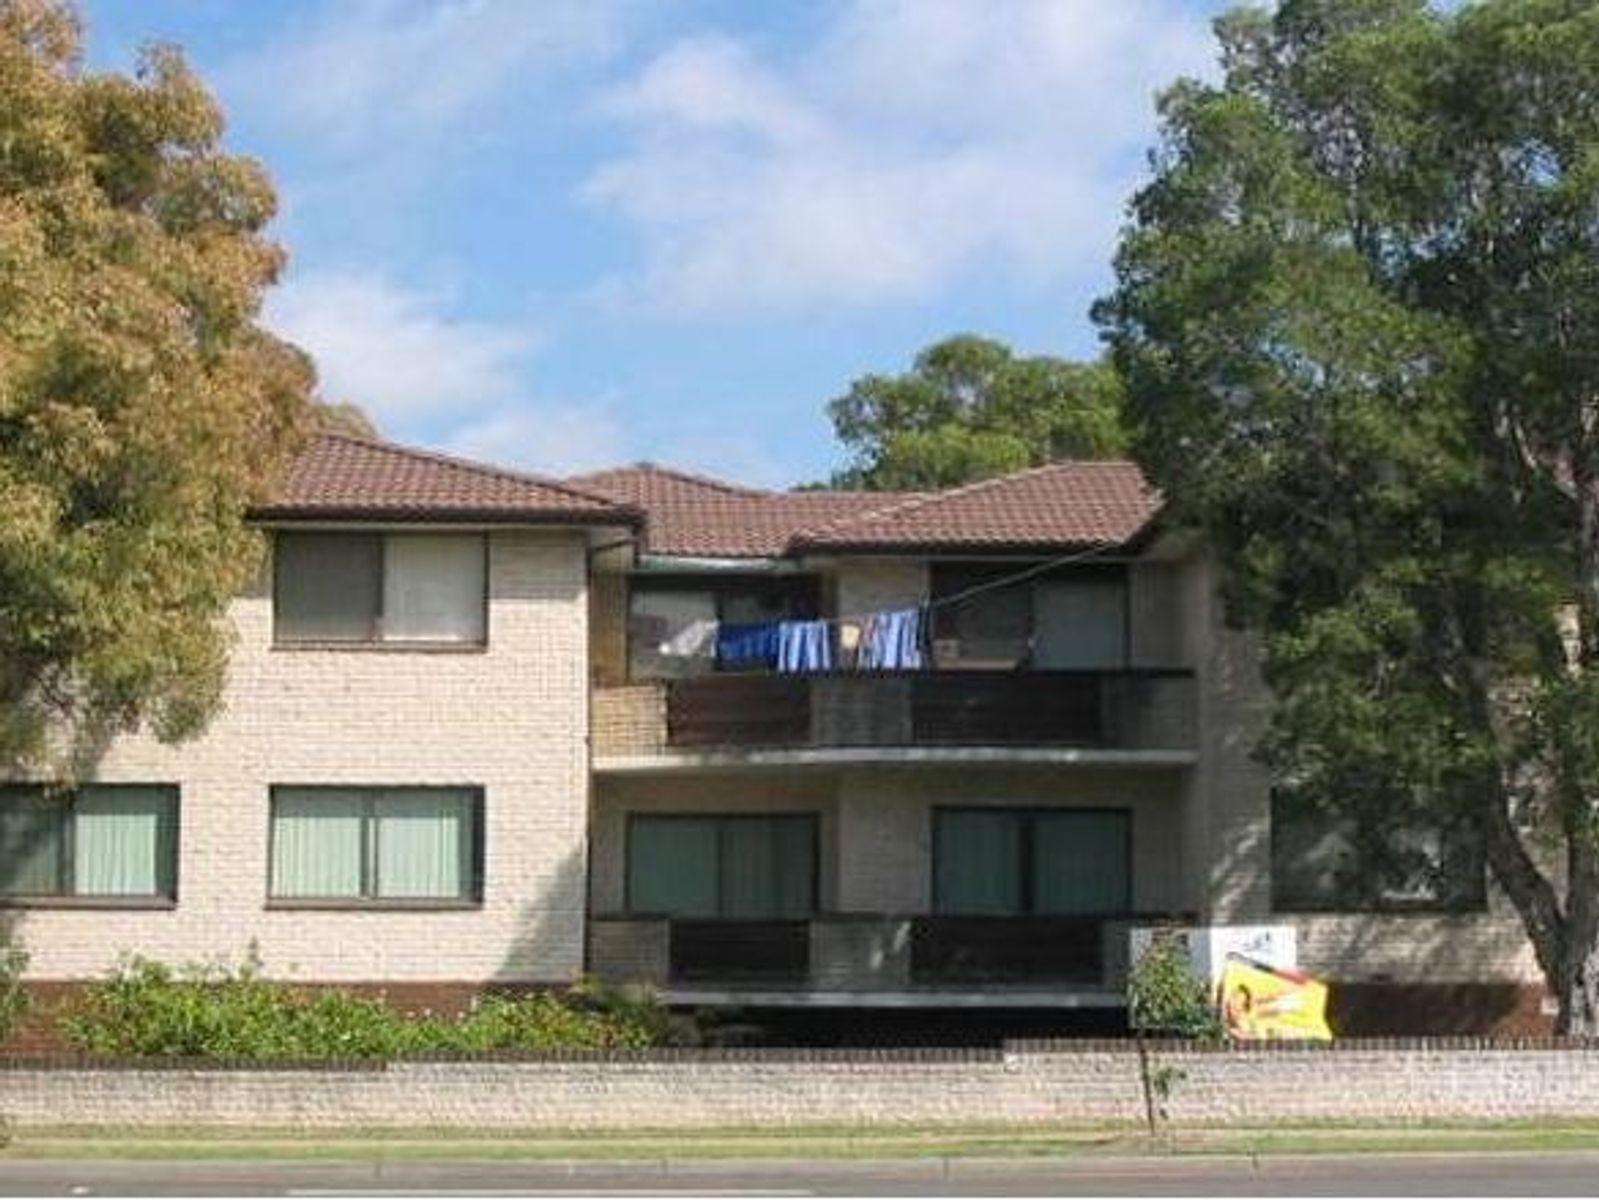 17/74-78 St Hilliers Road, Auburn, NSW 2144